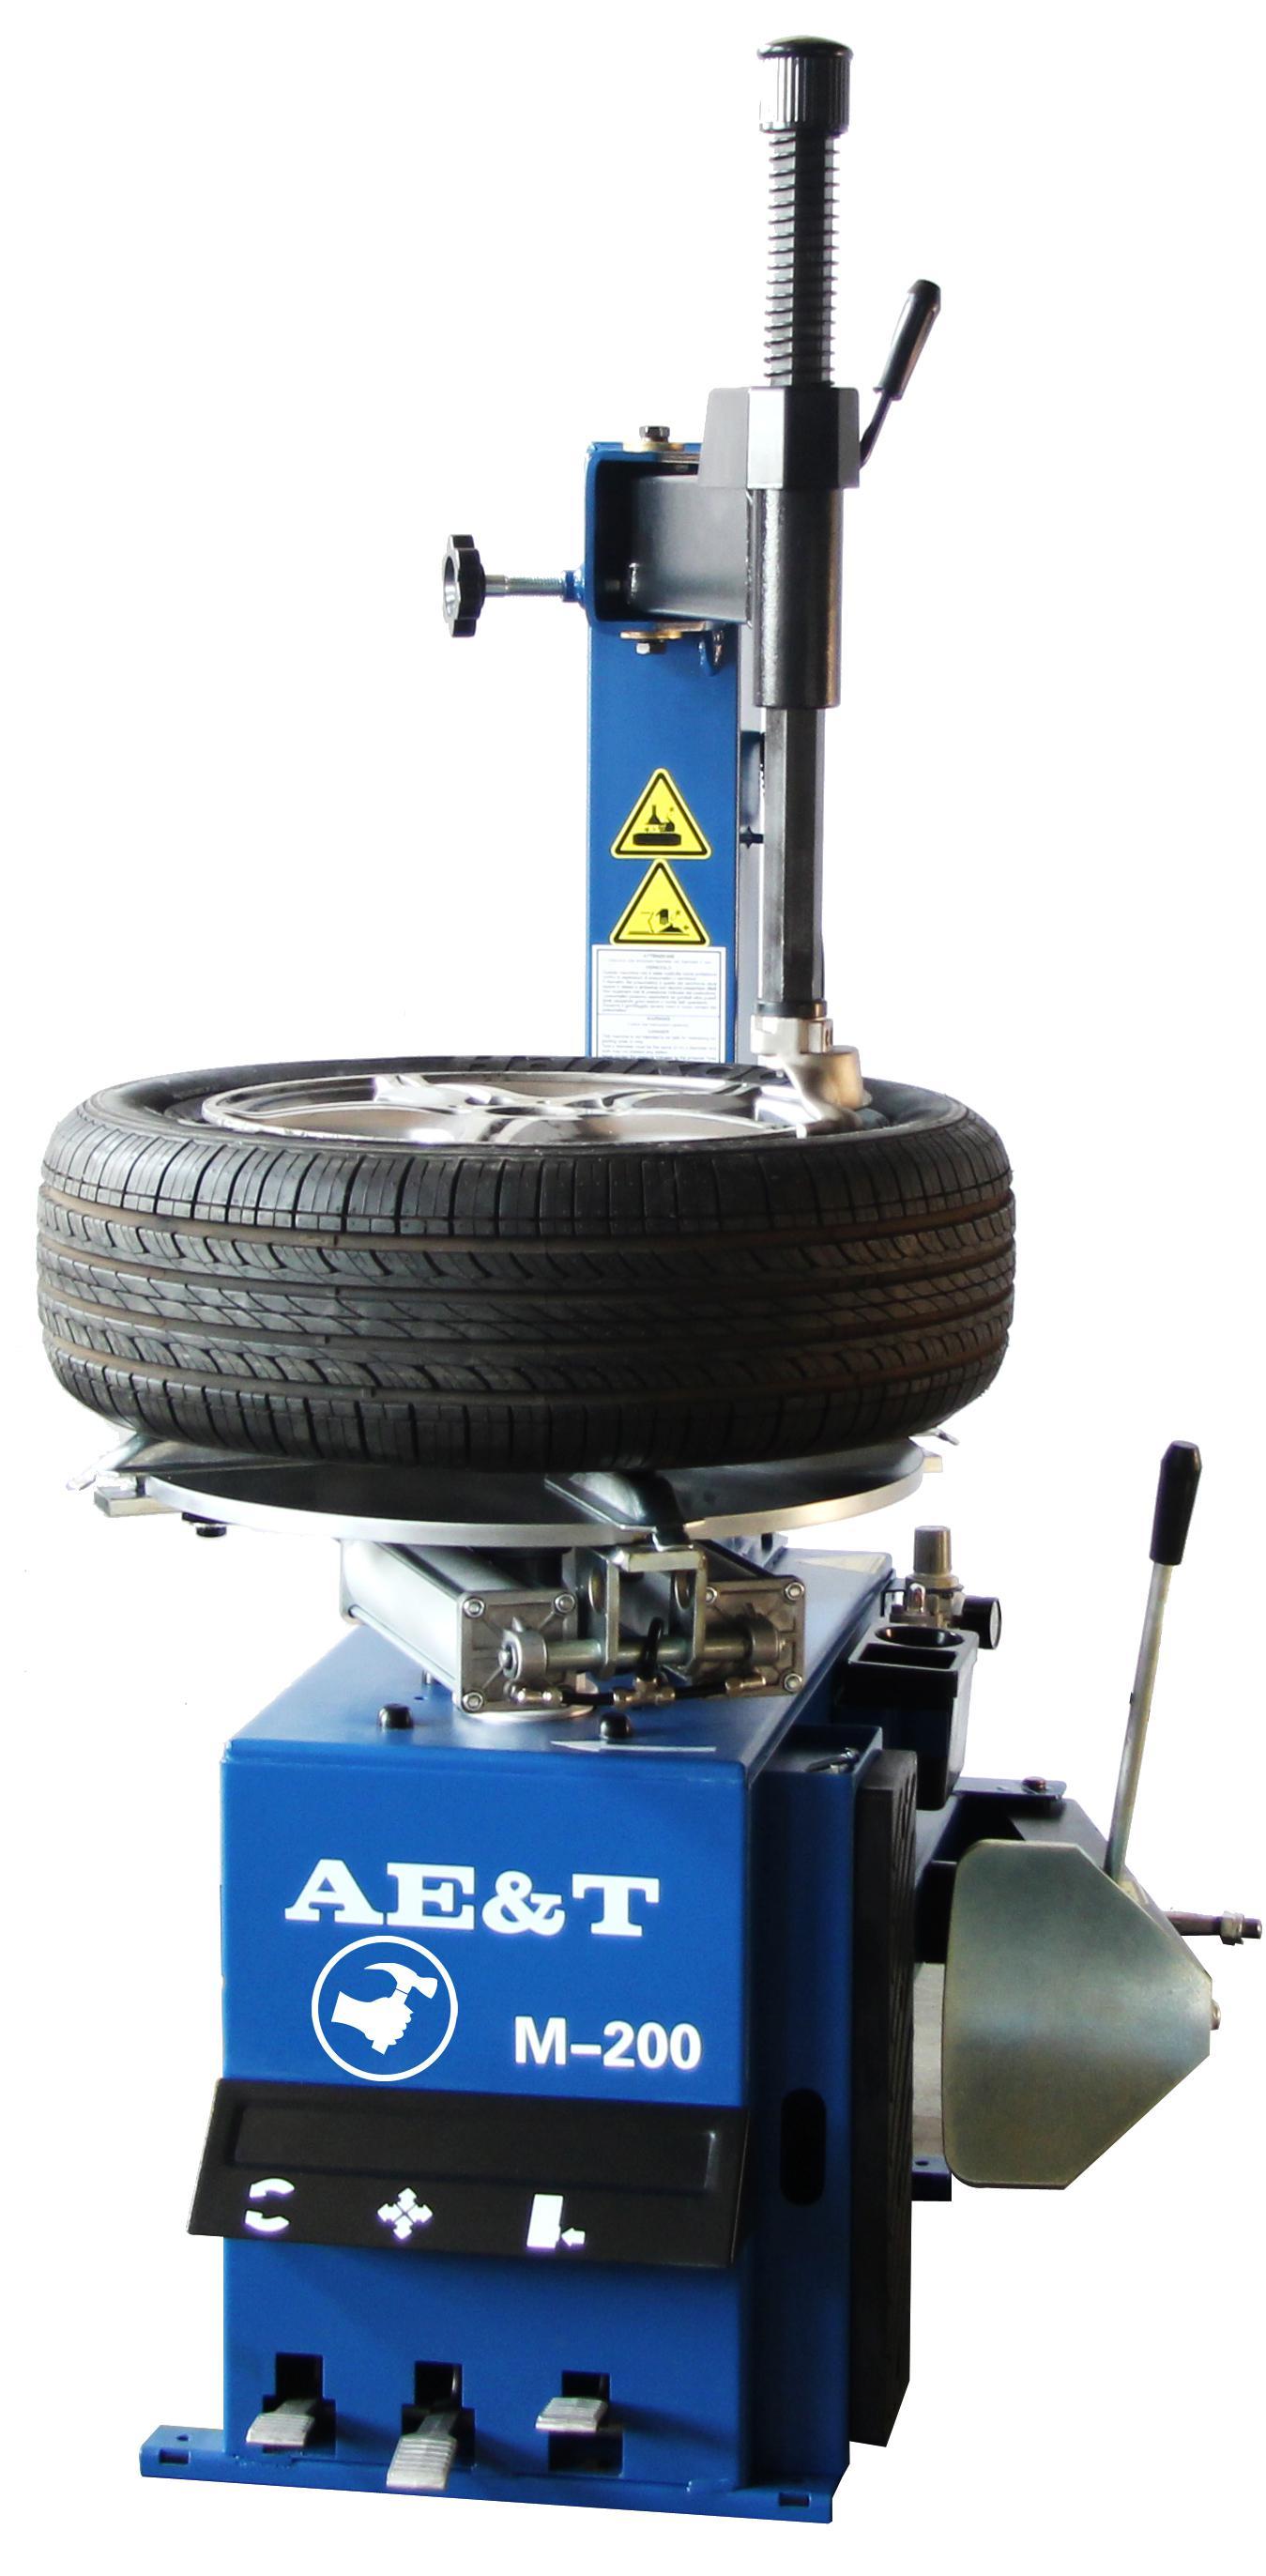 цена на Станок шиномонтажный Ae&t M-200 220b